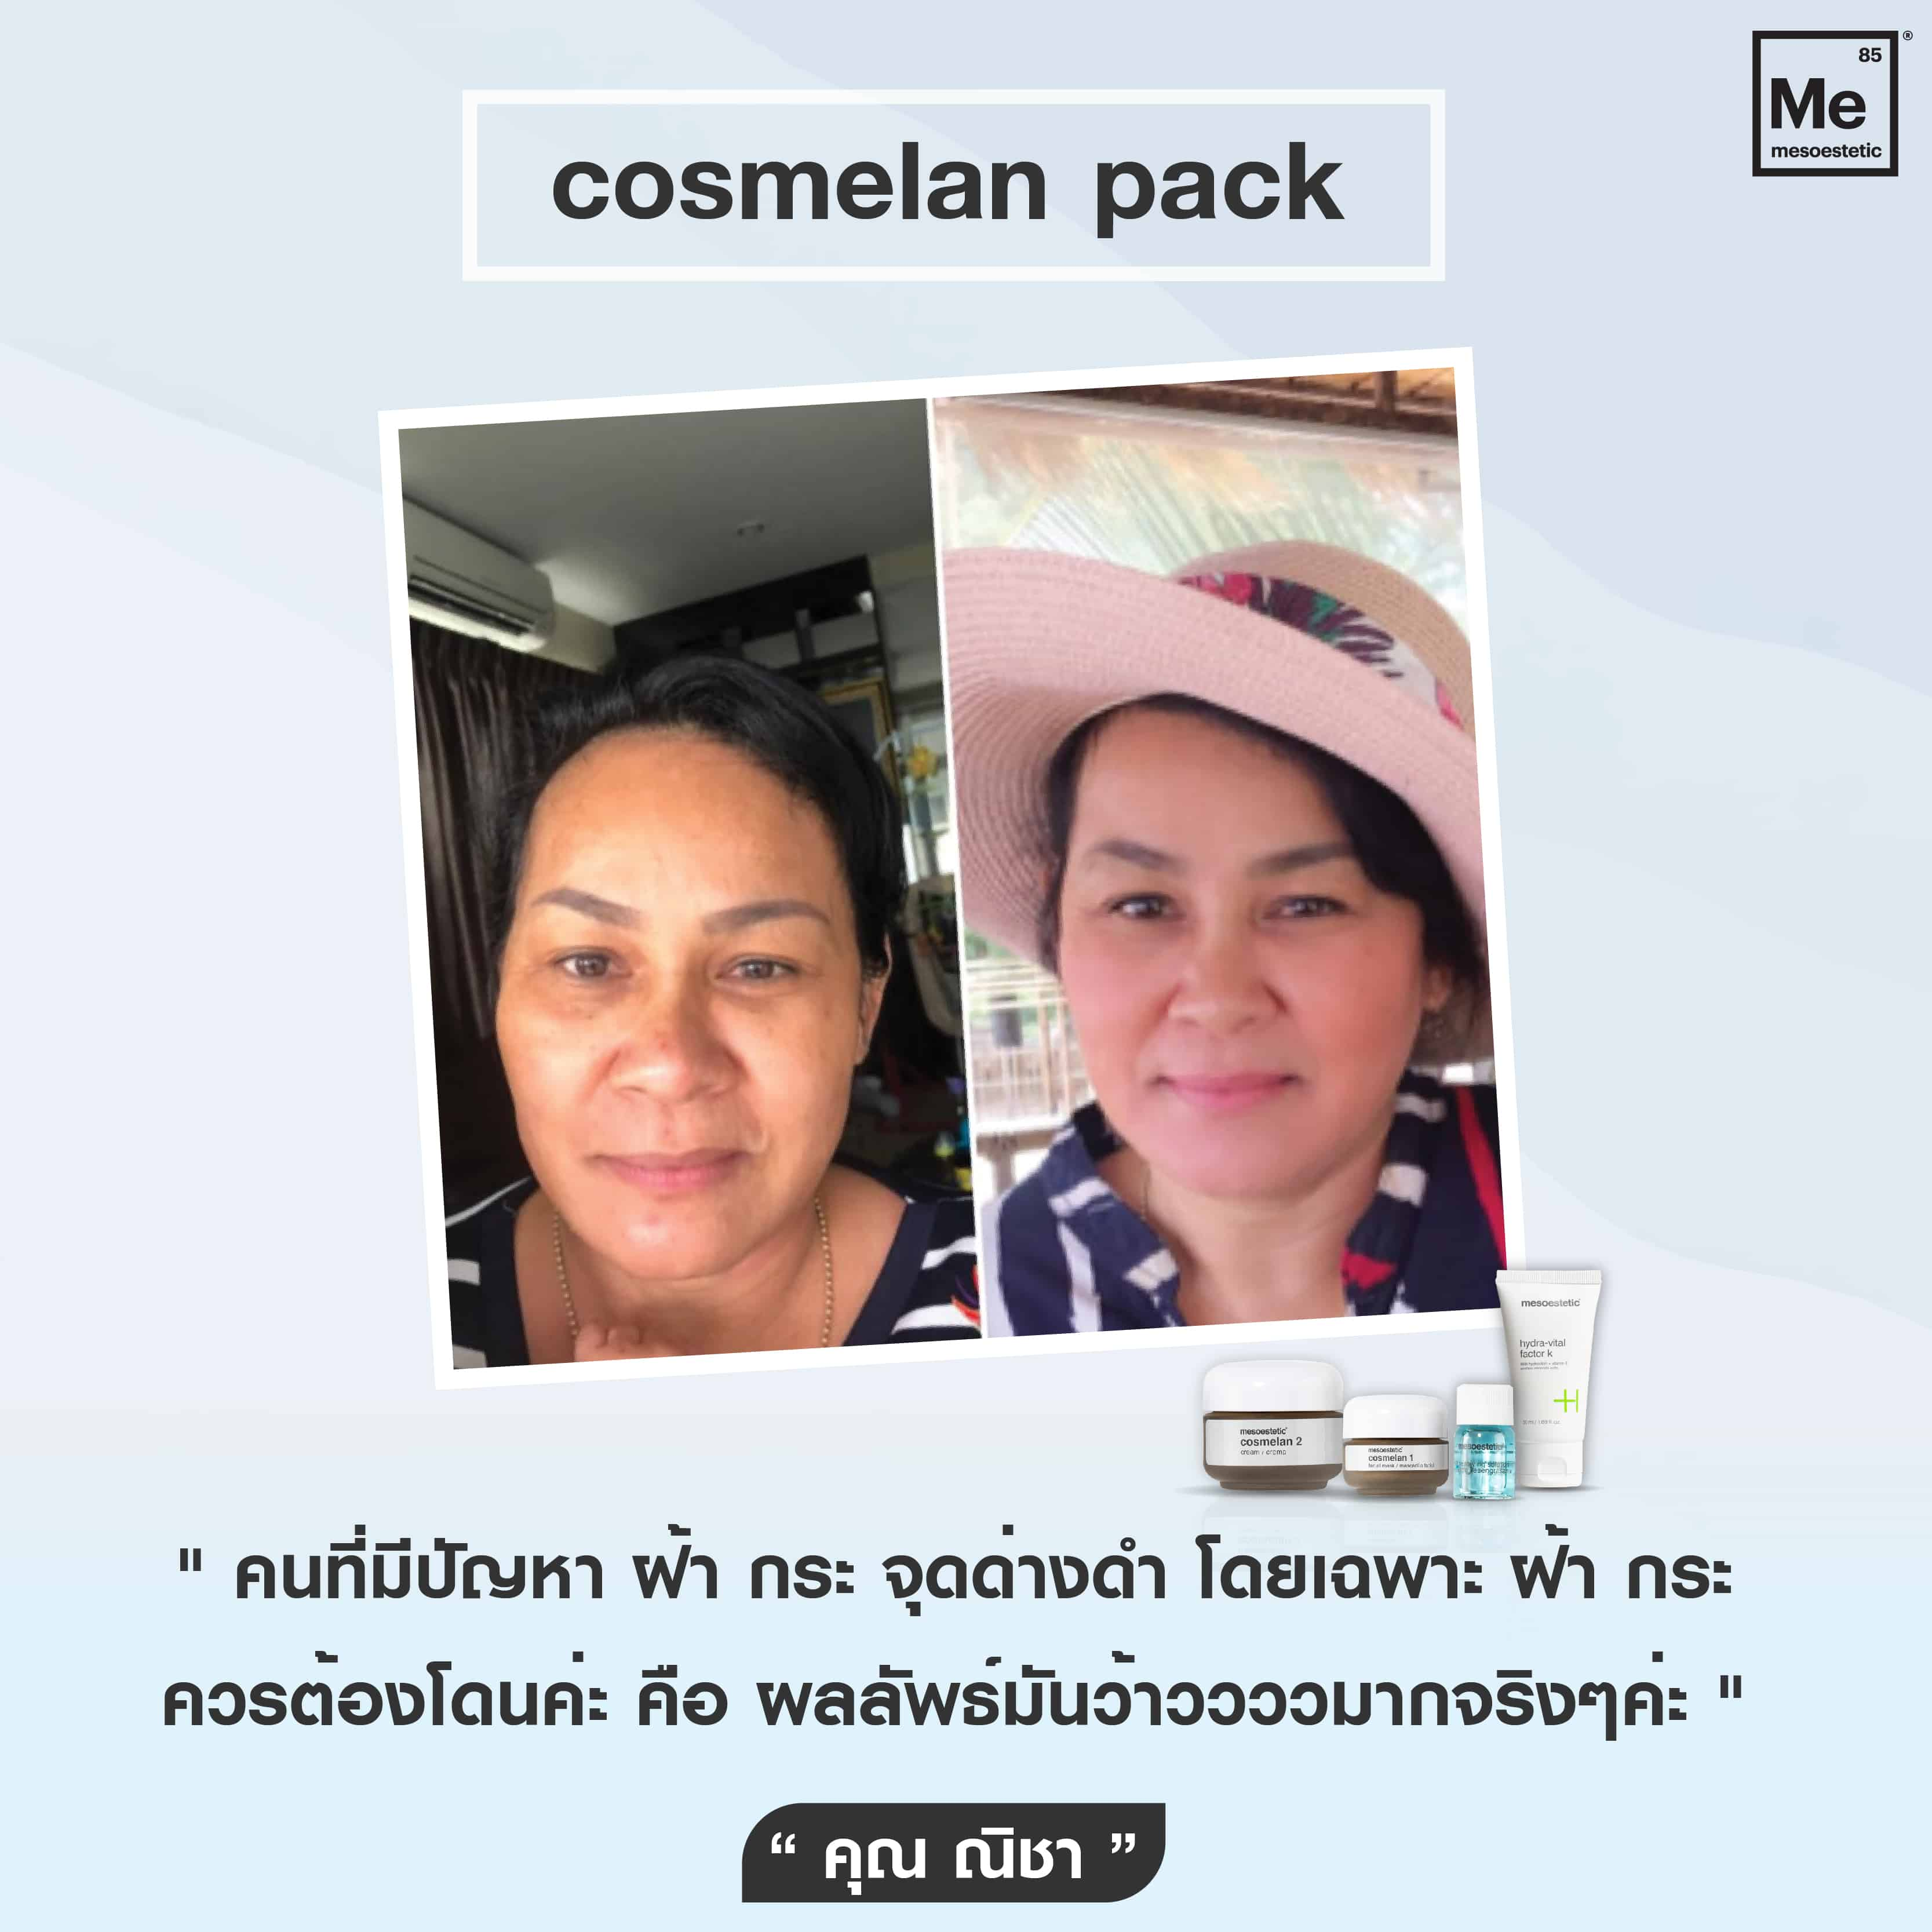 05 Review cosmelan-01